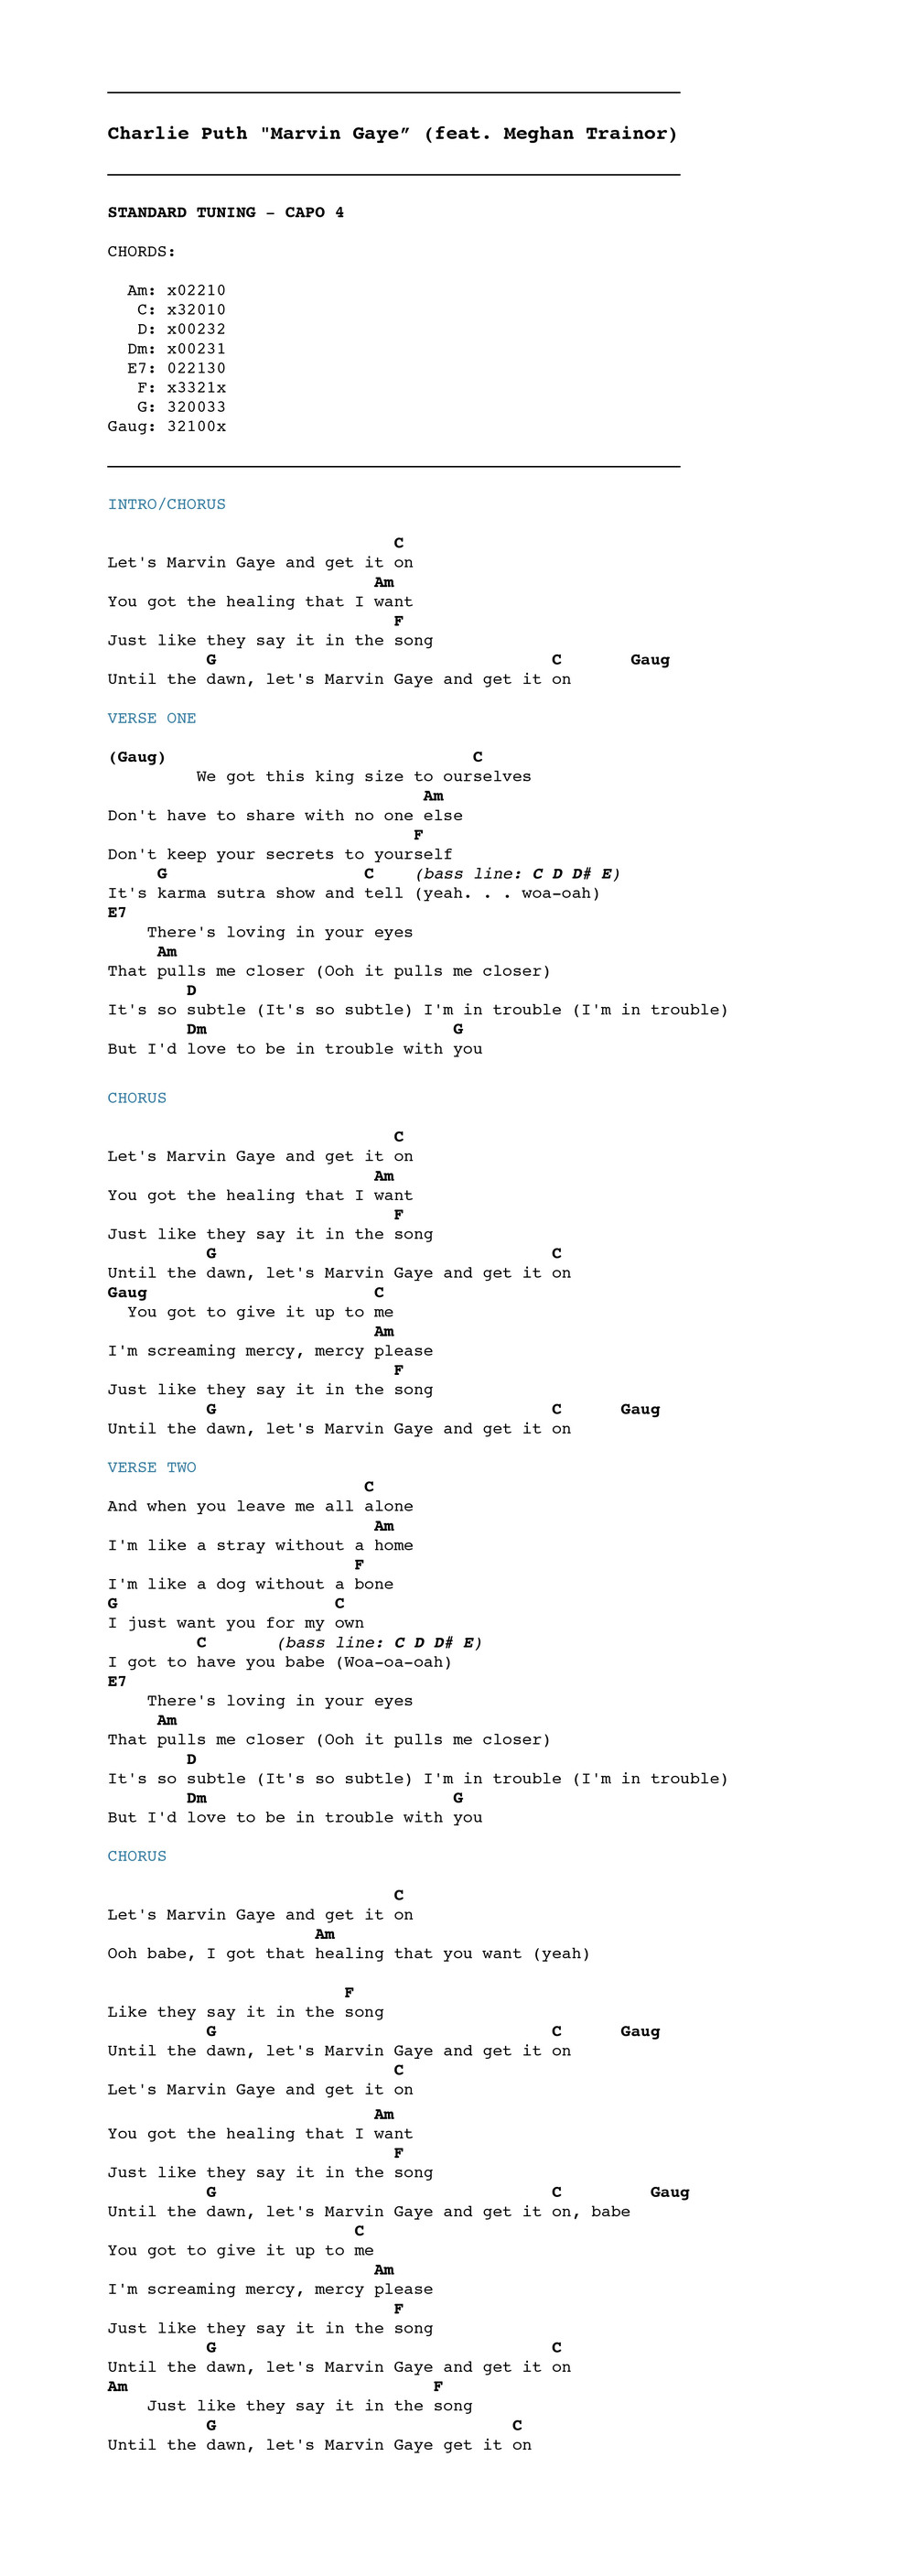 Good guitar chord songs